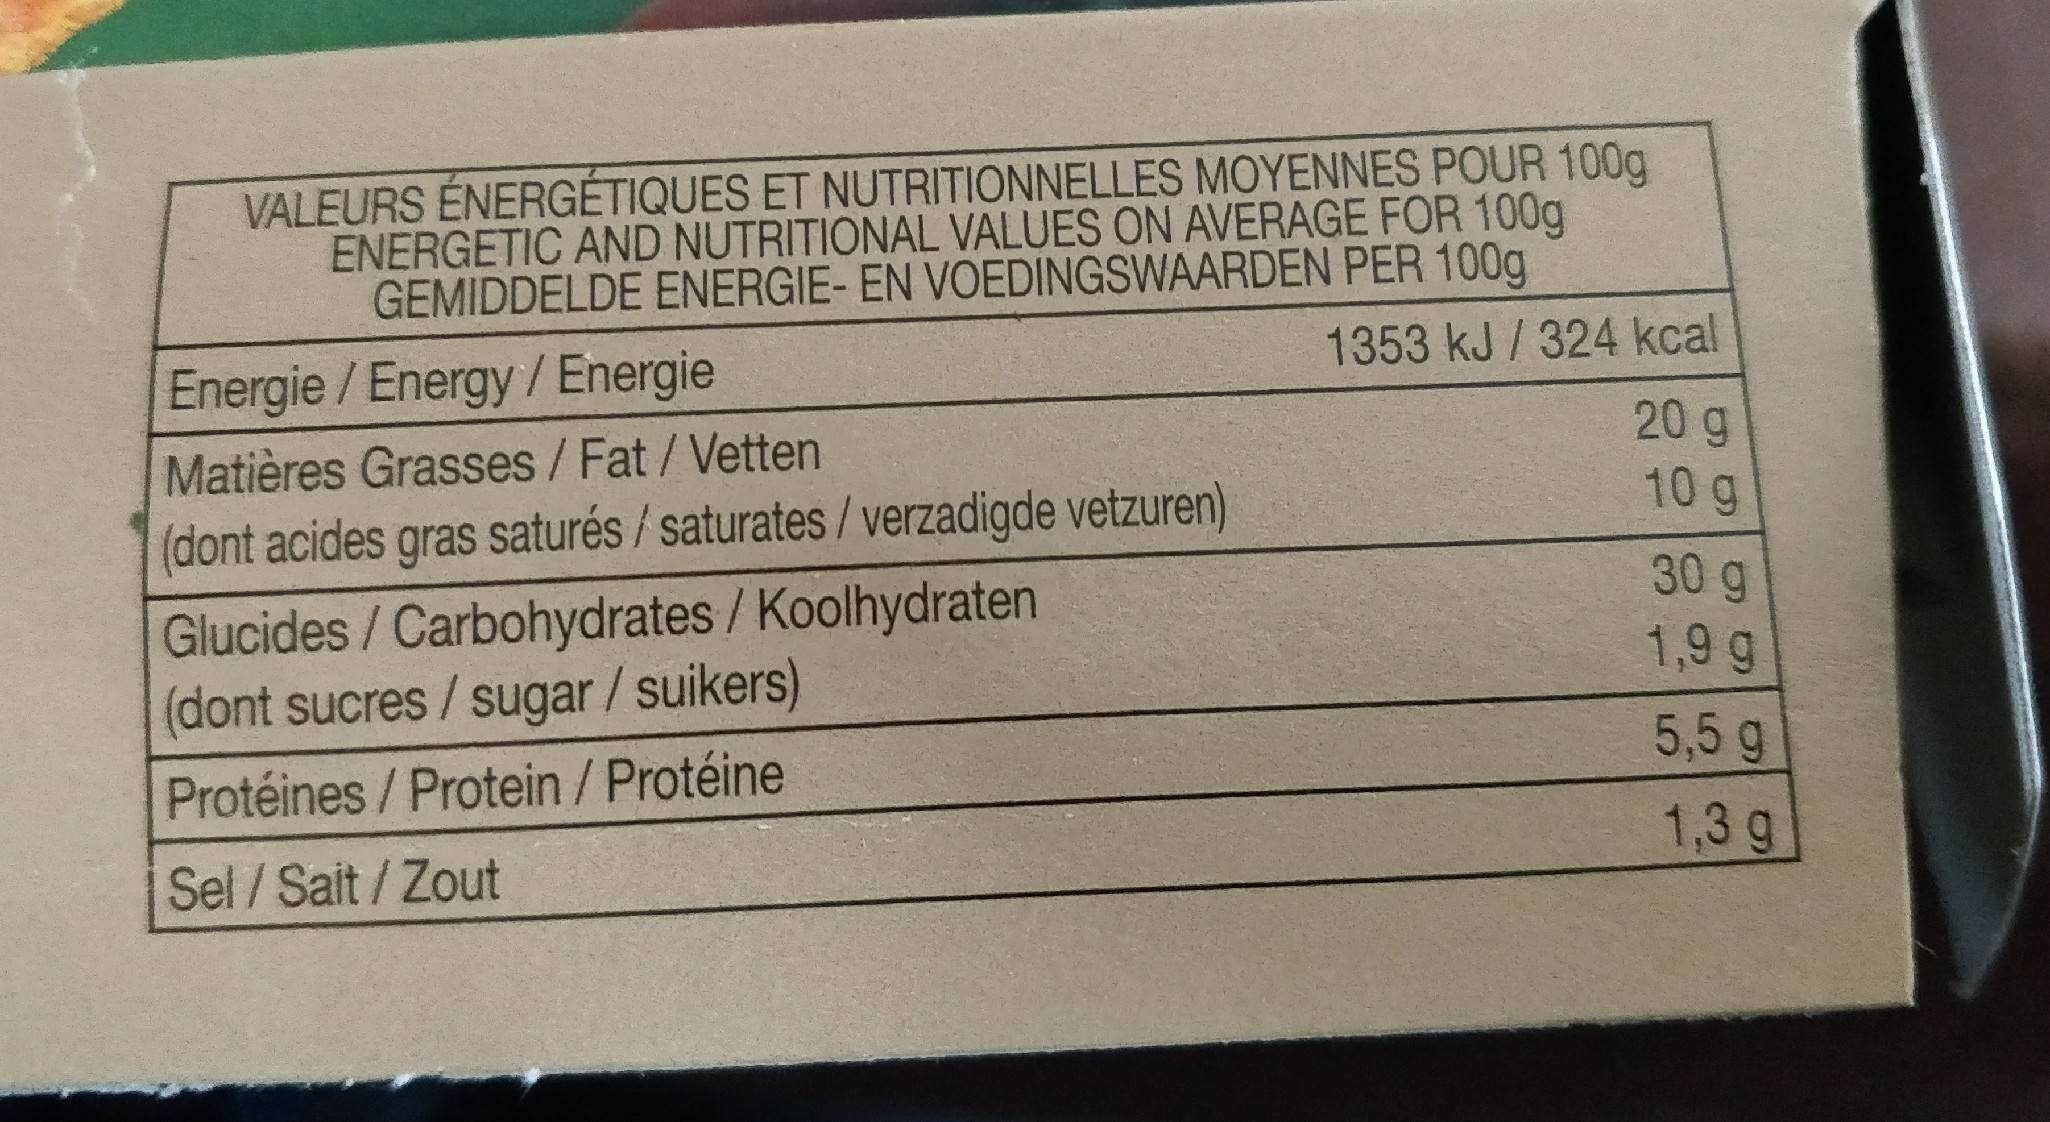 sapin en hiver - Nutrition facts